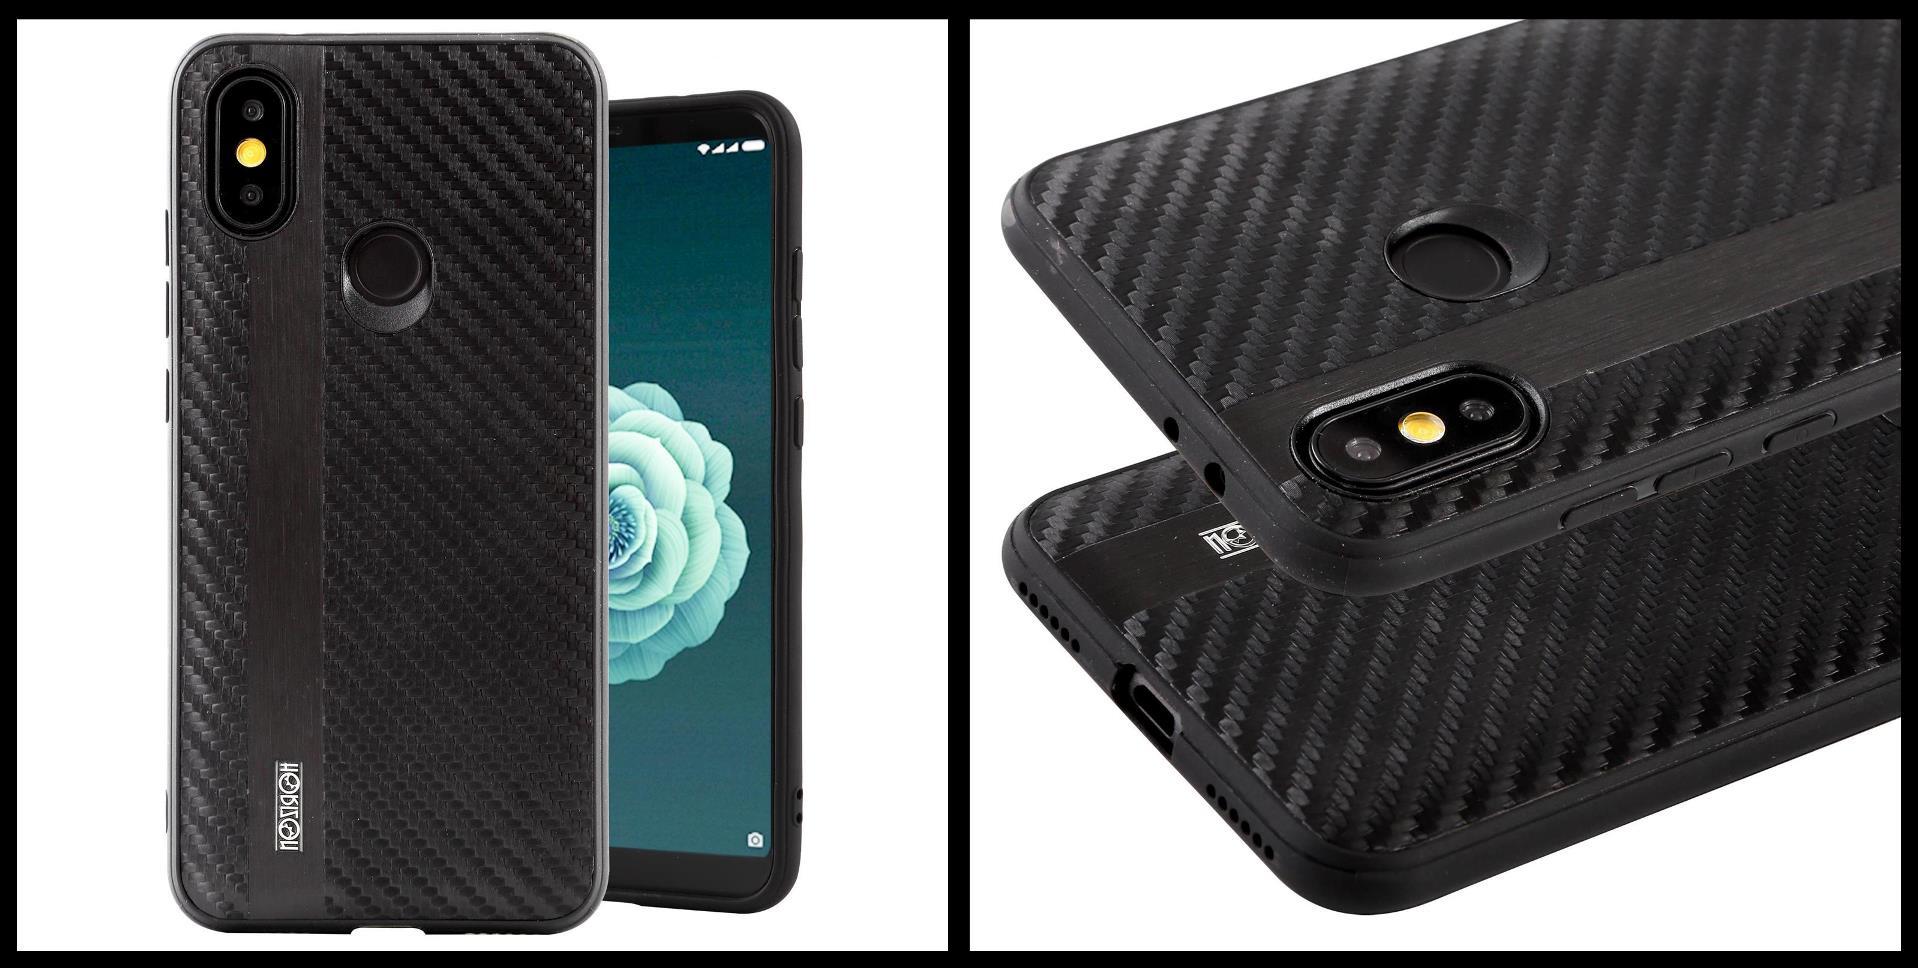 noziroh-carbon-xiaomi-mi-a2-mi6x-cover-case-shockproof-dark-design-black